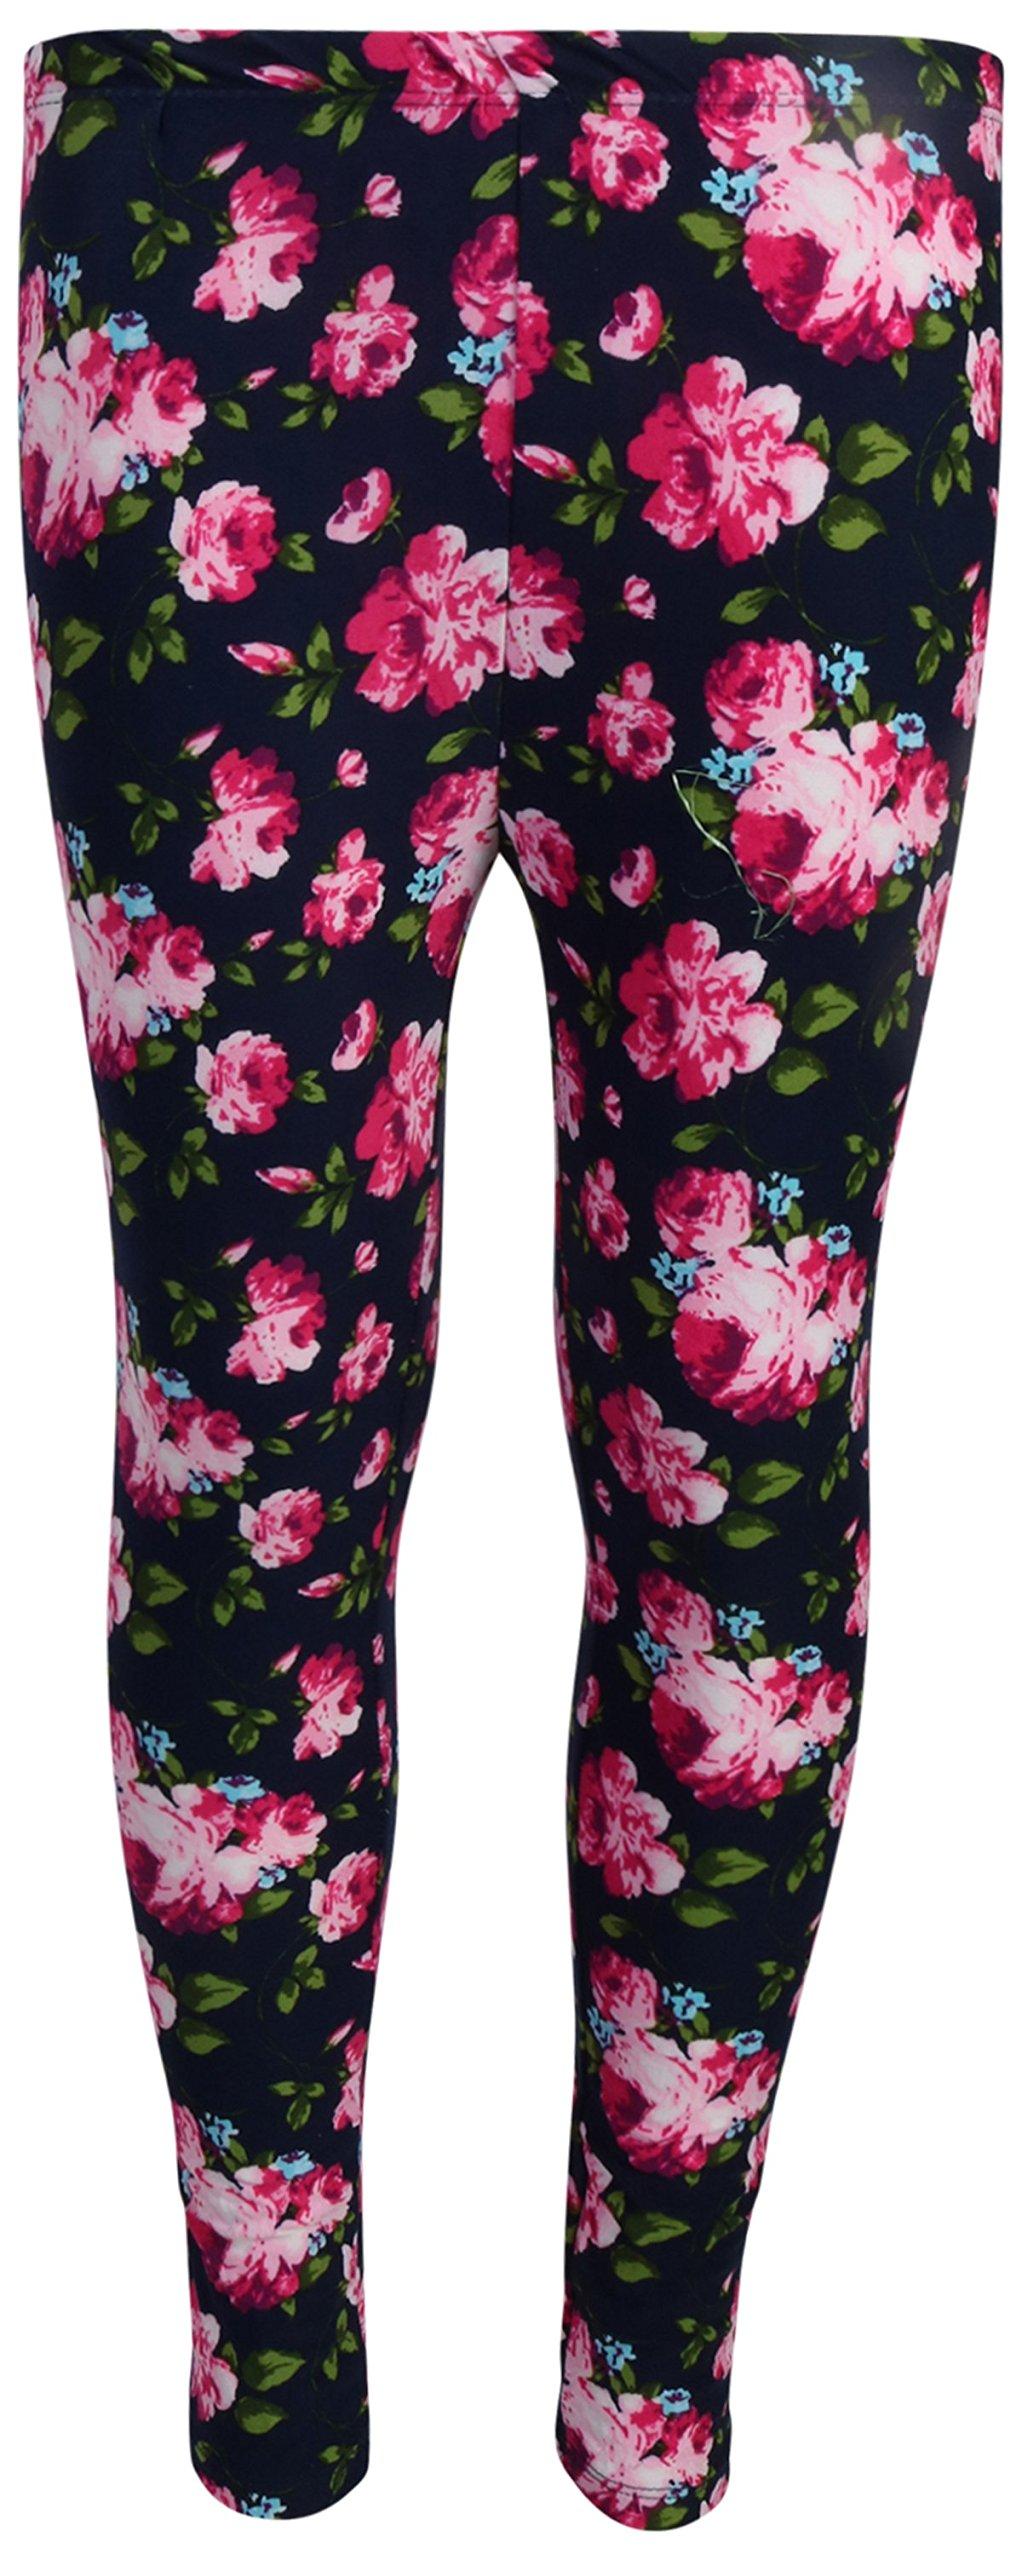 dELiA*s 'dELiAs 4 Pack Girl's Basic Yummy Active Leggings, Navy Flower/Diamond, Size 7/8' by dELiA*s (Image #5)